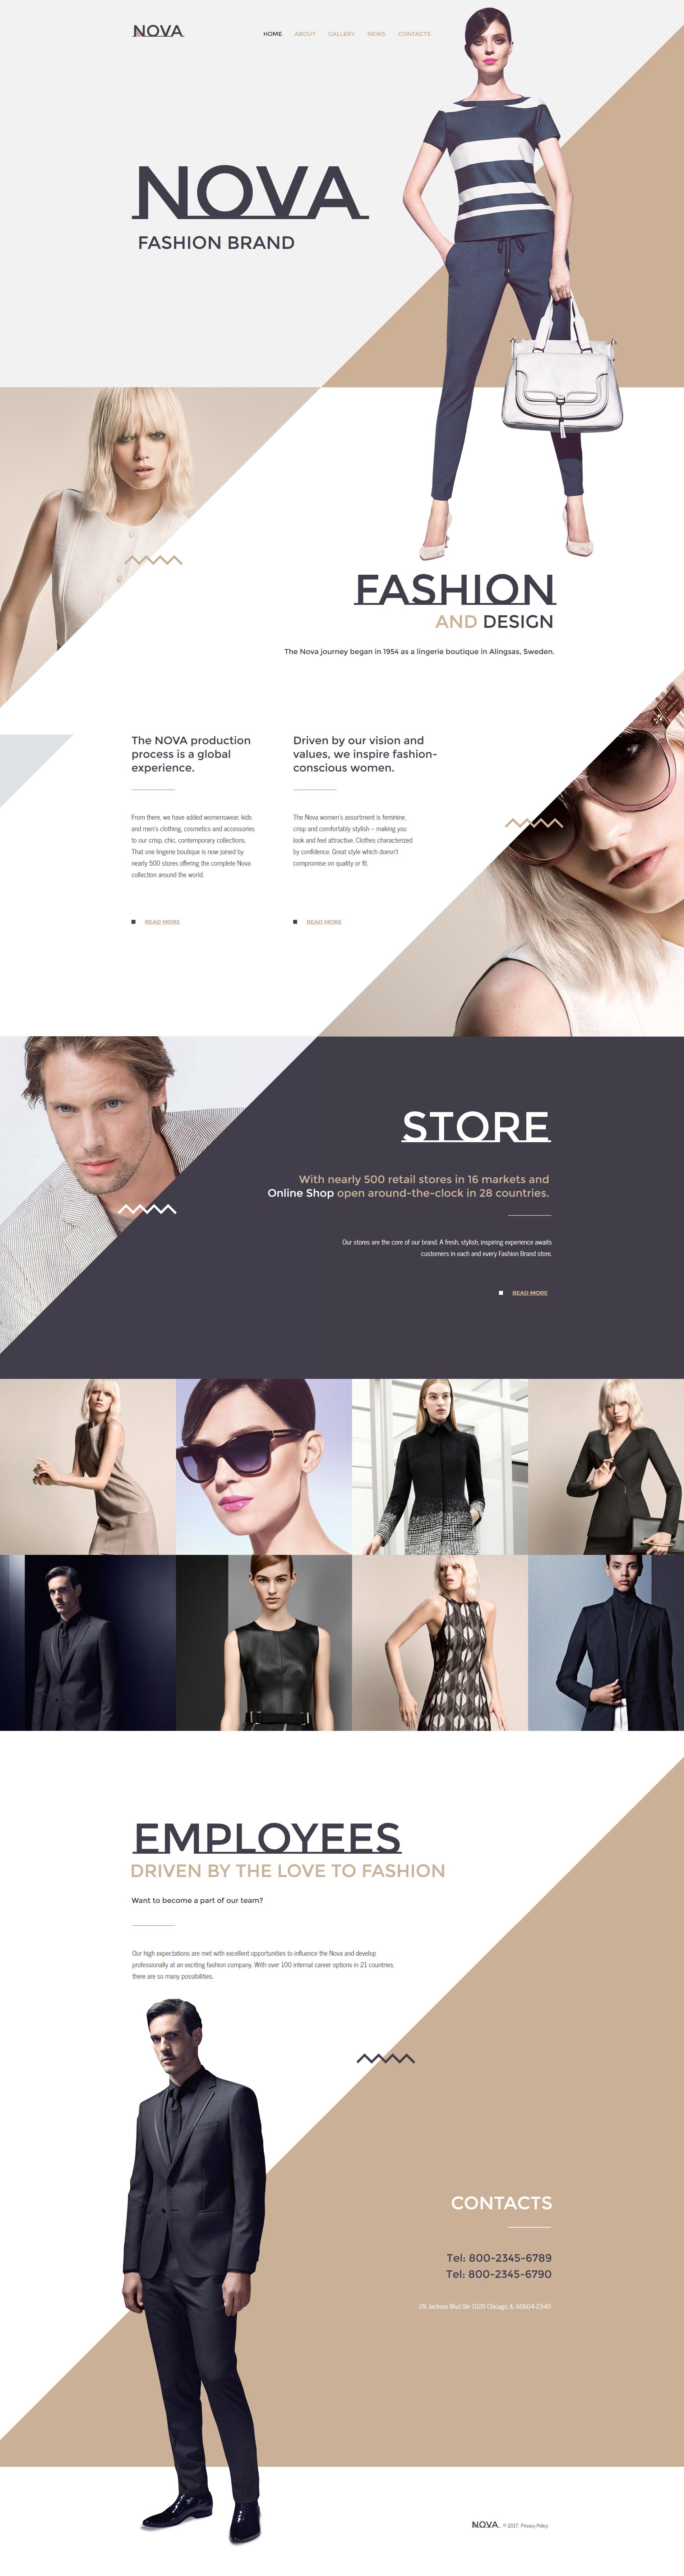 """Nova - Fashion"" modèle Moto CMS HTML Premium #59307"